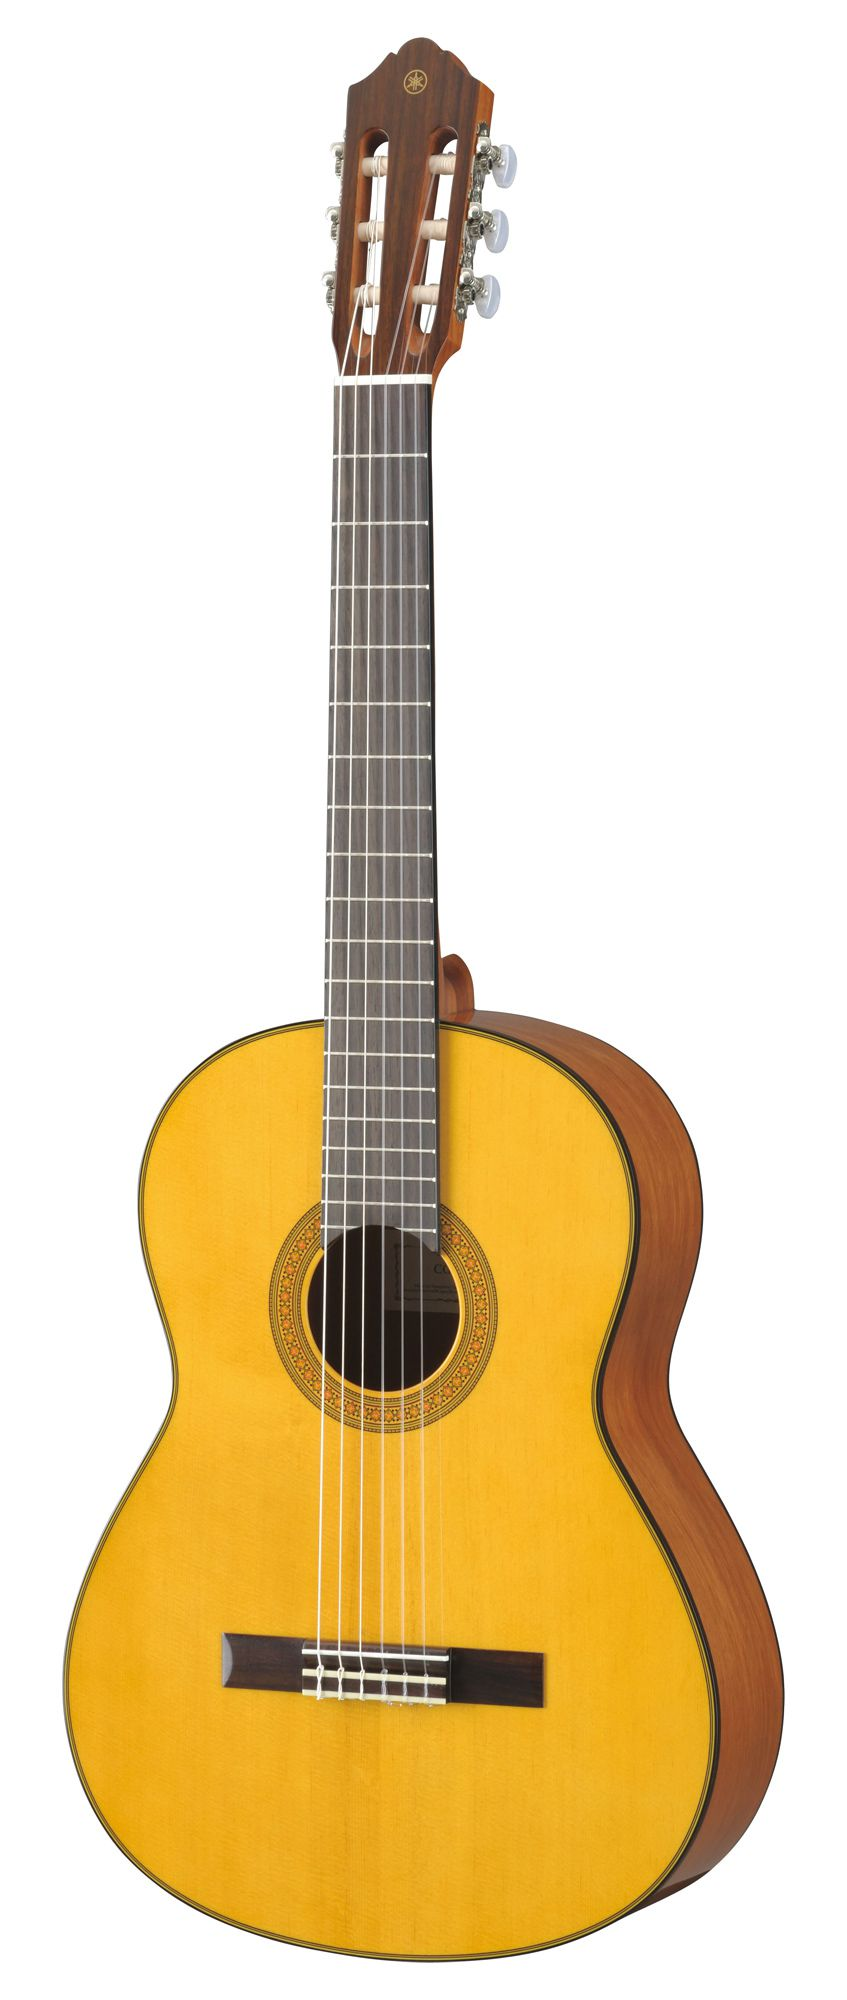 Violão Yamaha CG142S - Natural